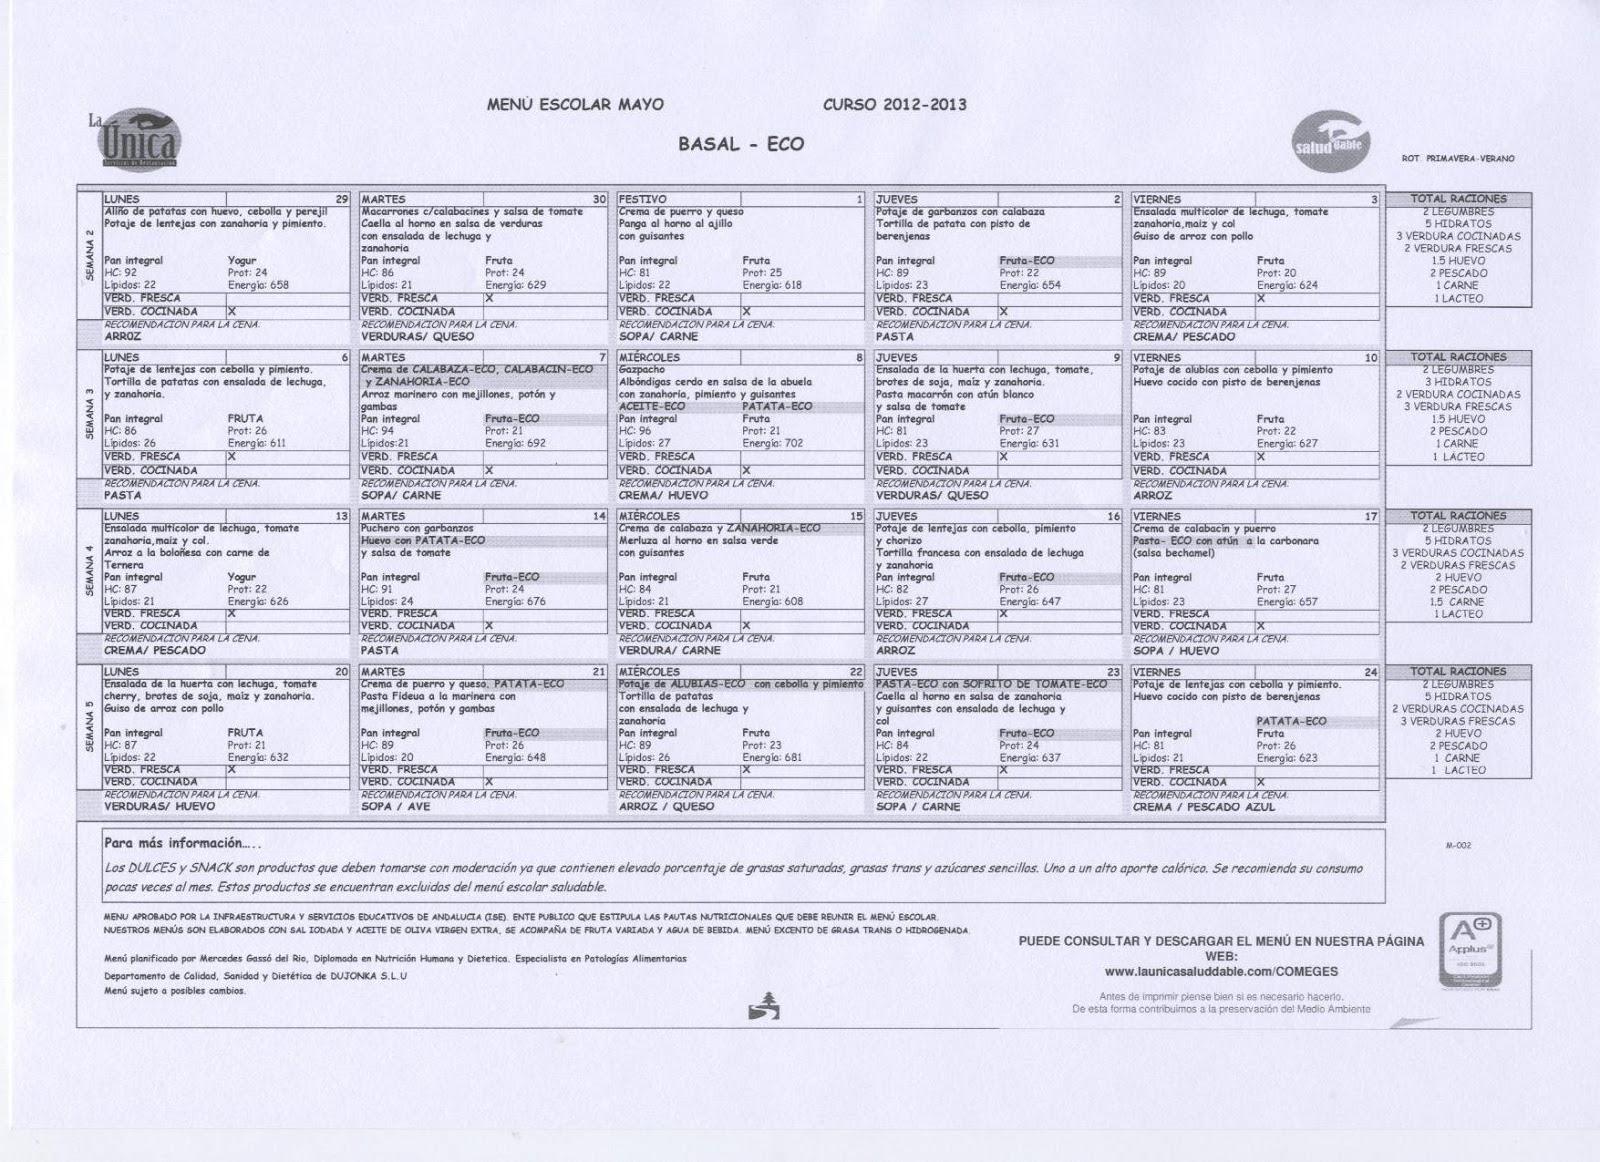 Comedores Ugr Calendario.